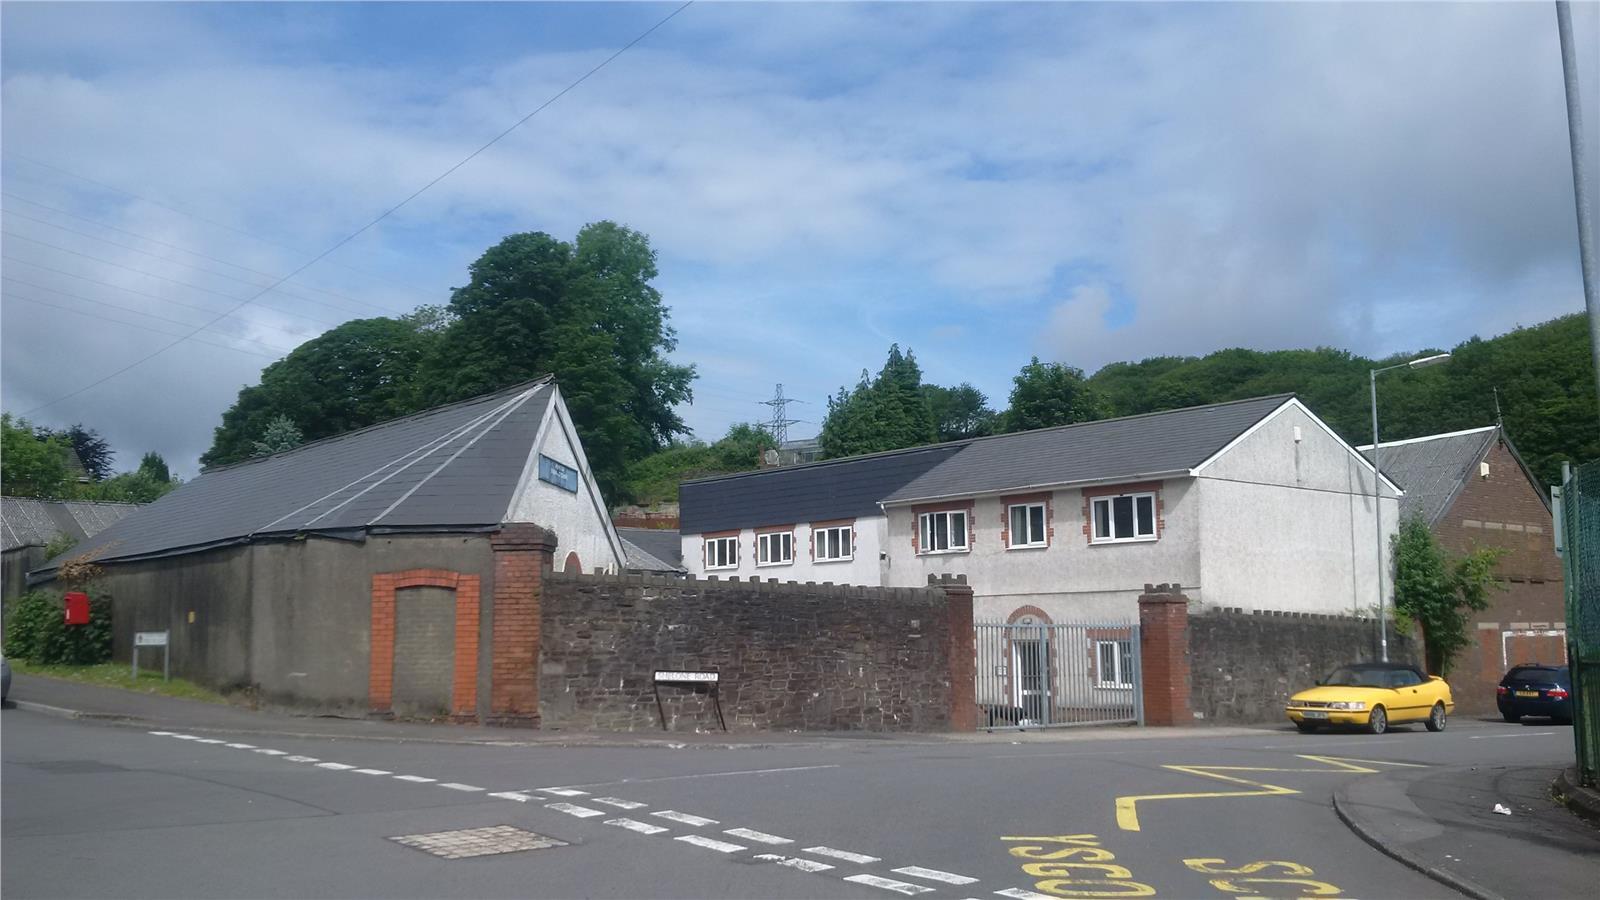 Morvern Business Centre, Church Street, Neath, West Glamorgan, SA11